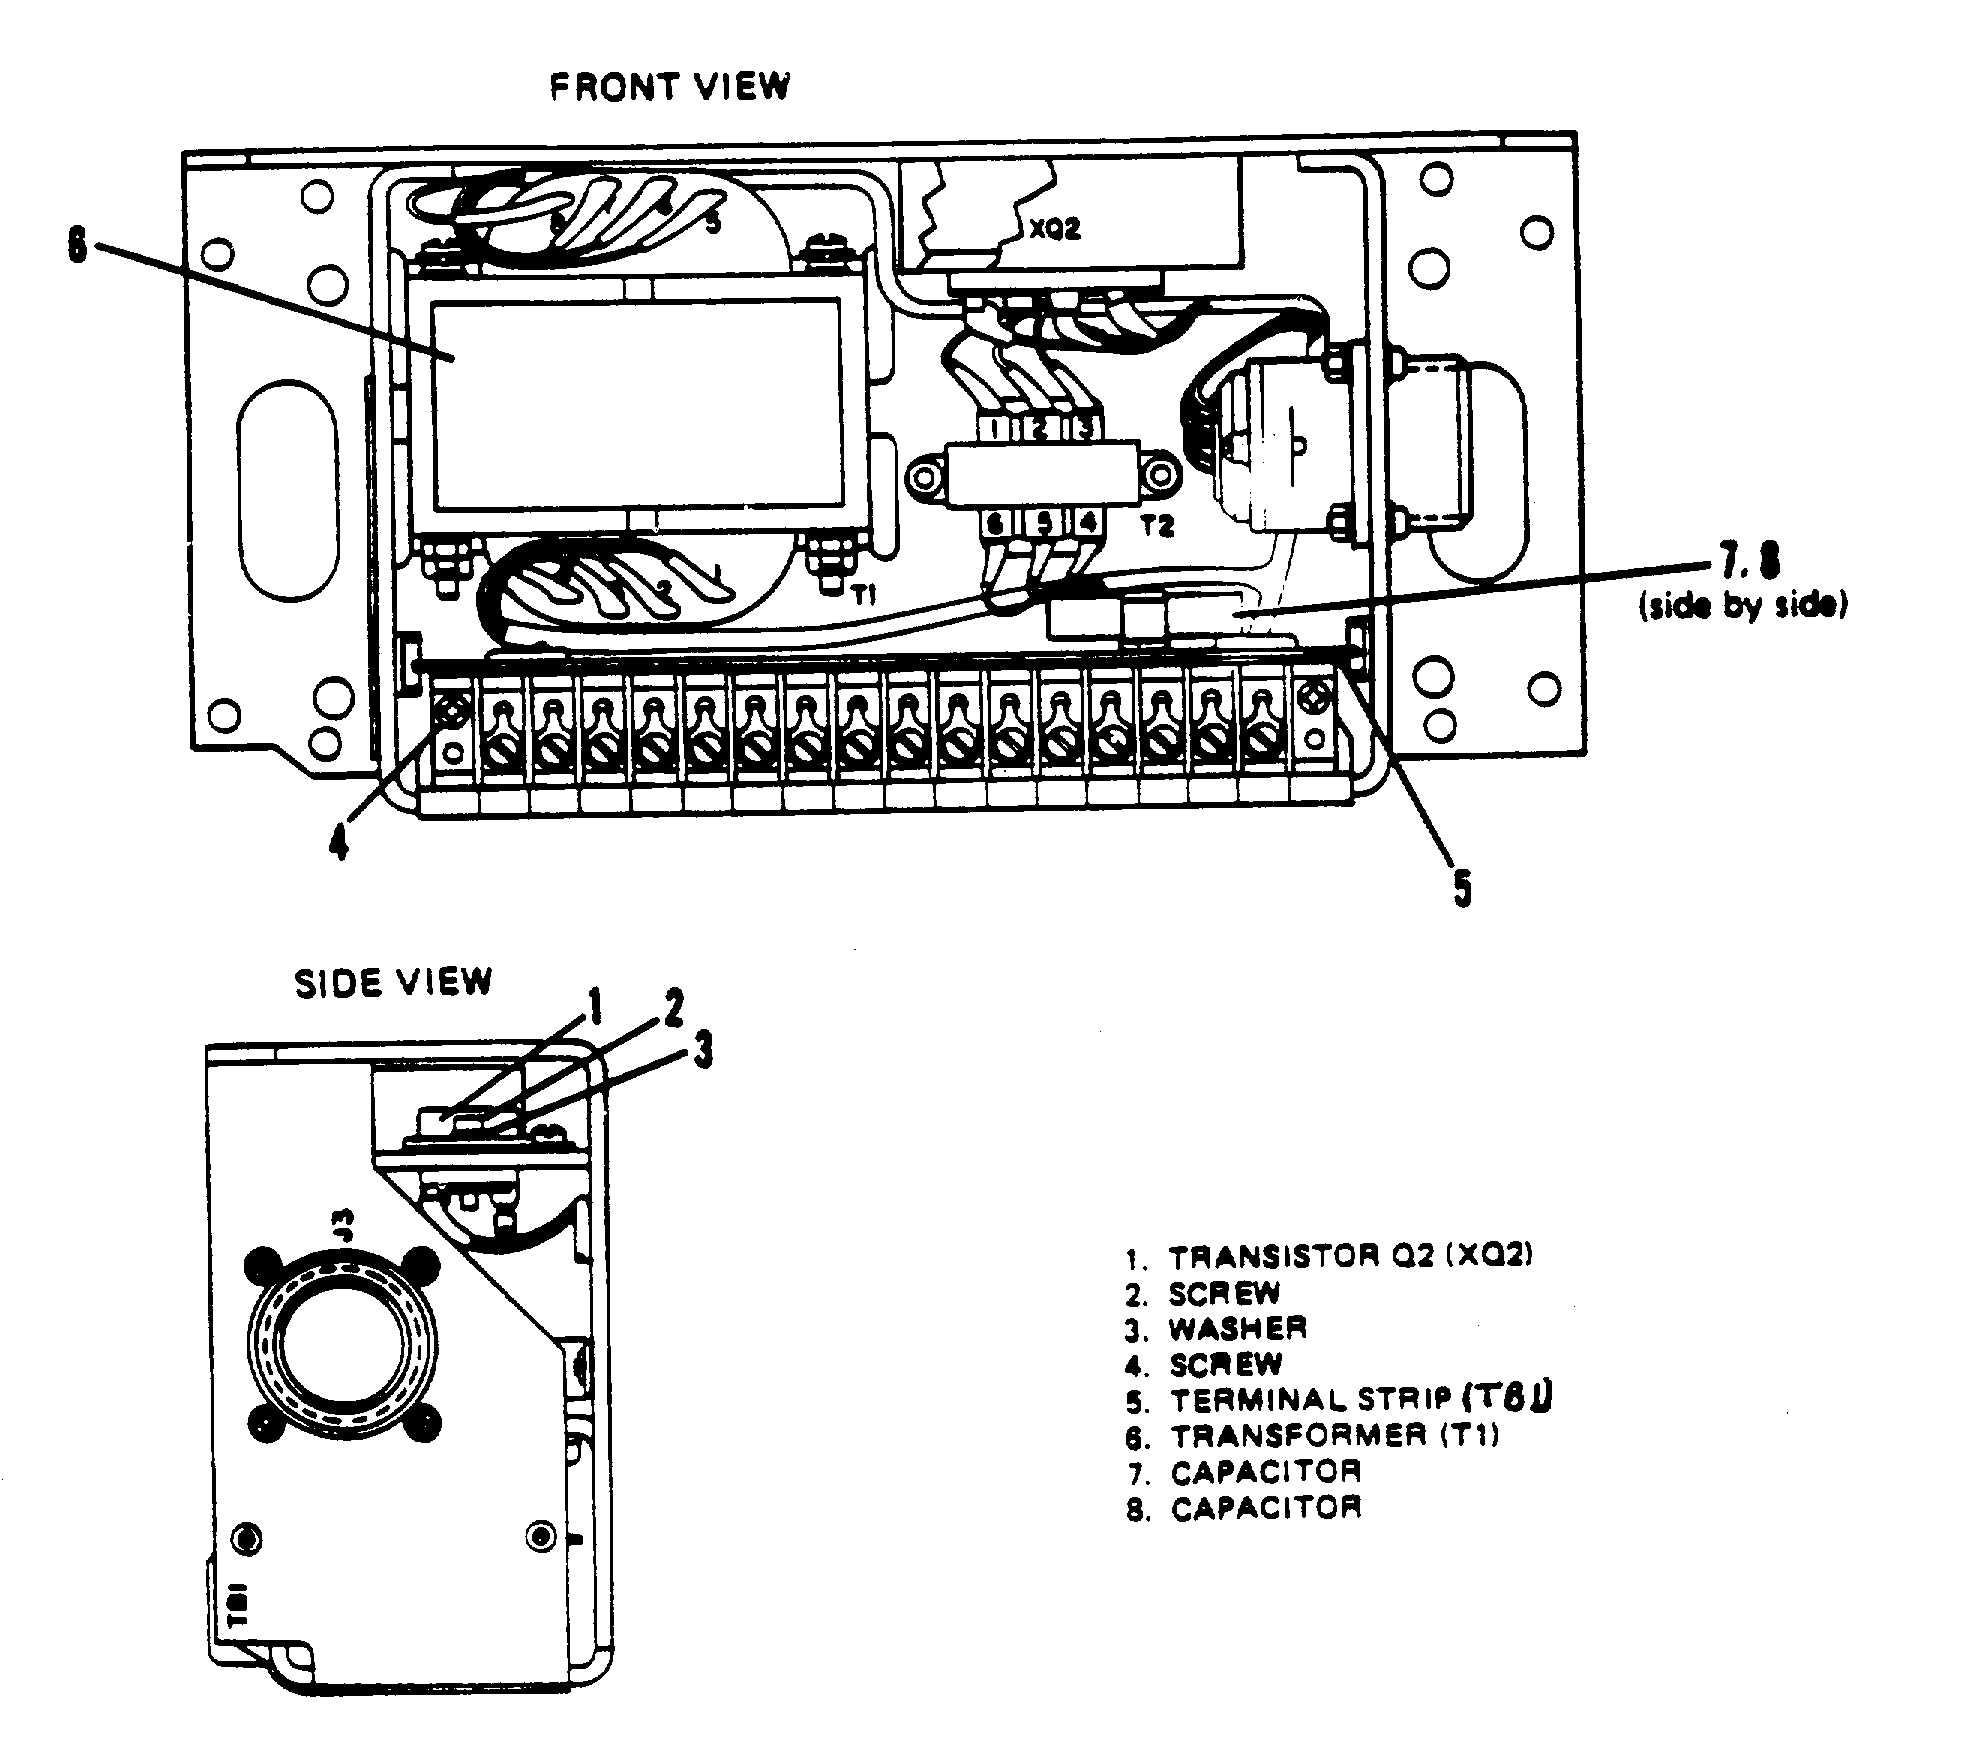 thermodisc 59t wiring diagram intercity furnace parts electrical tm 5 6115 silverado trailer